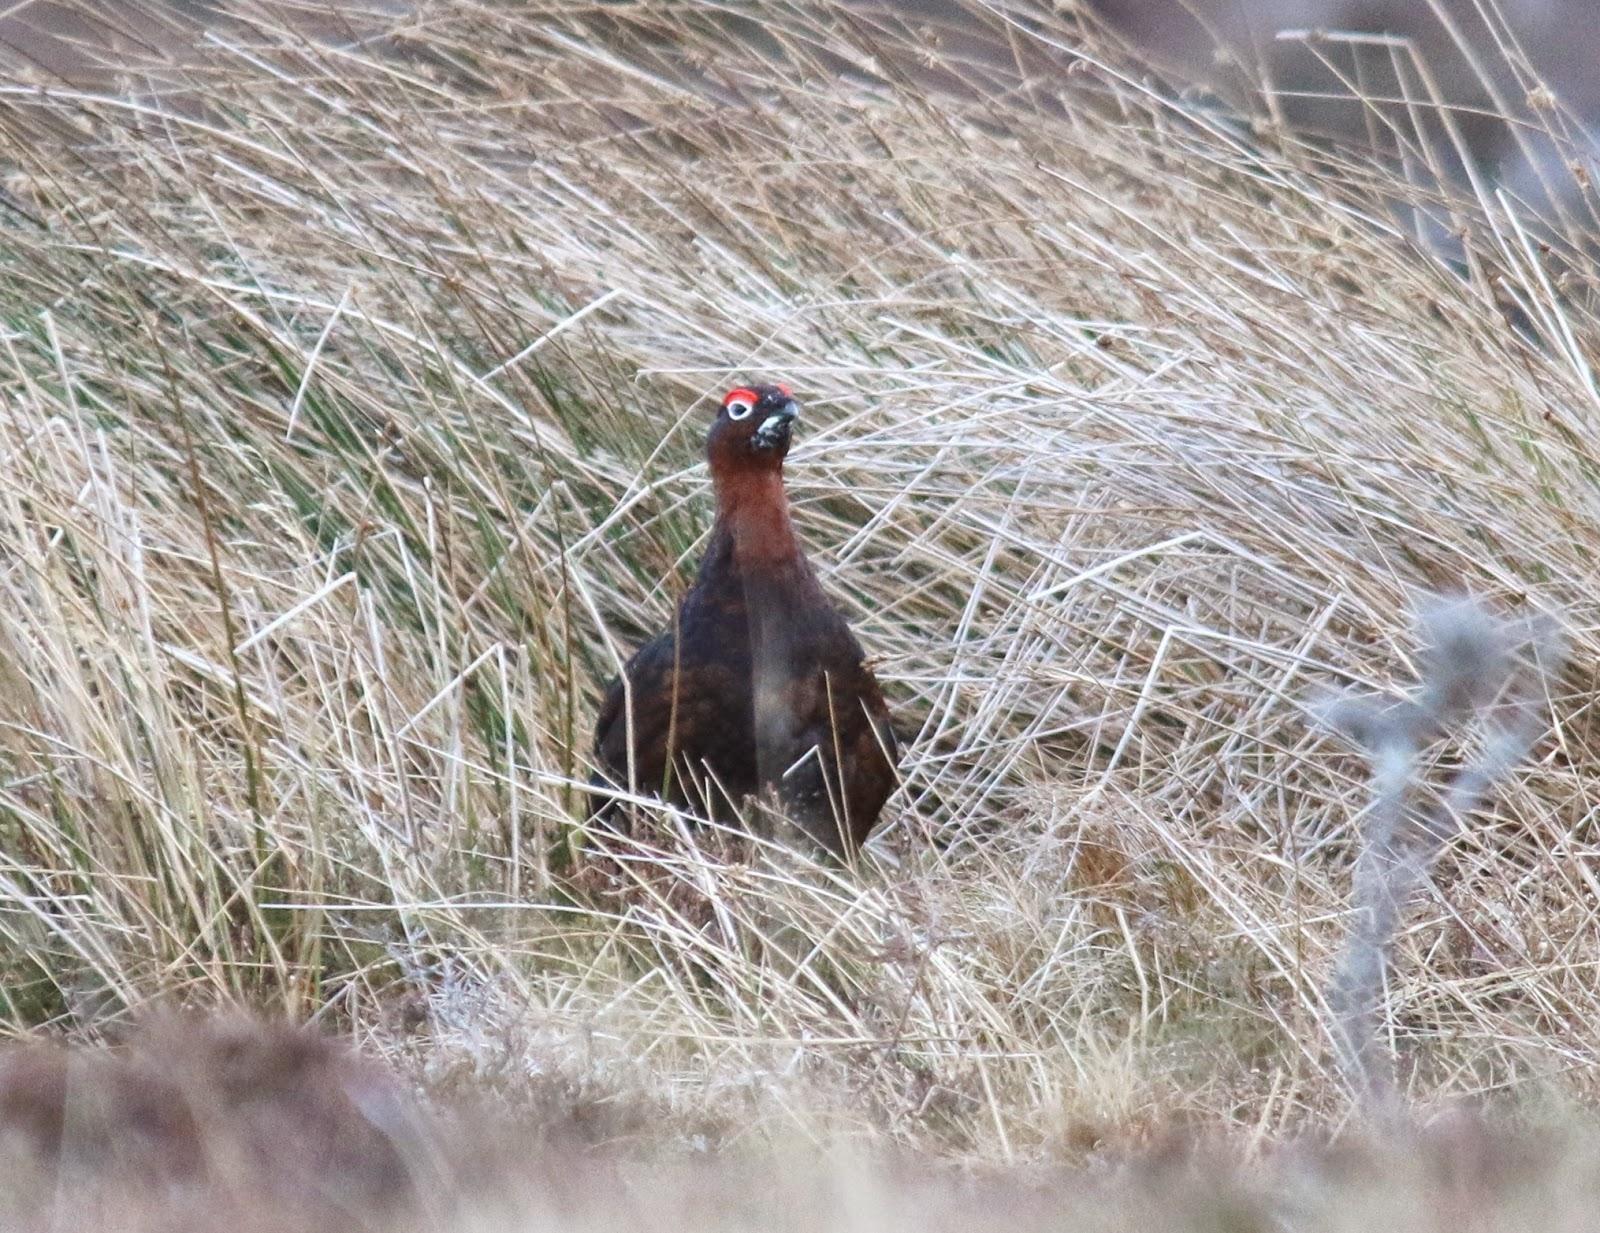 Moysie\'s Birding Blog: Scotland Trip - Day 1